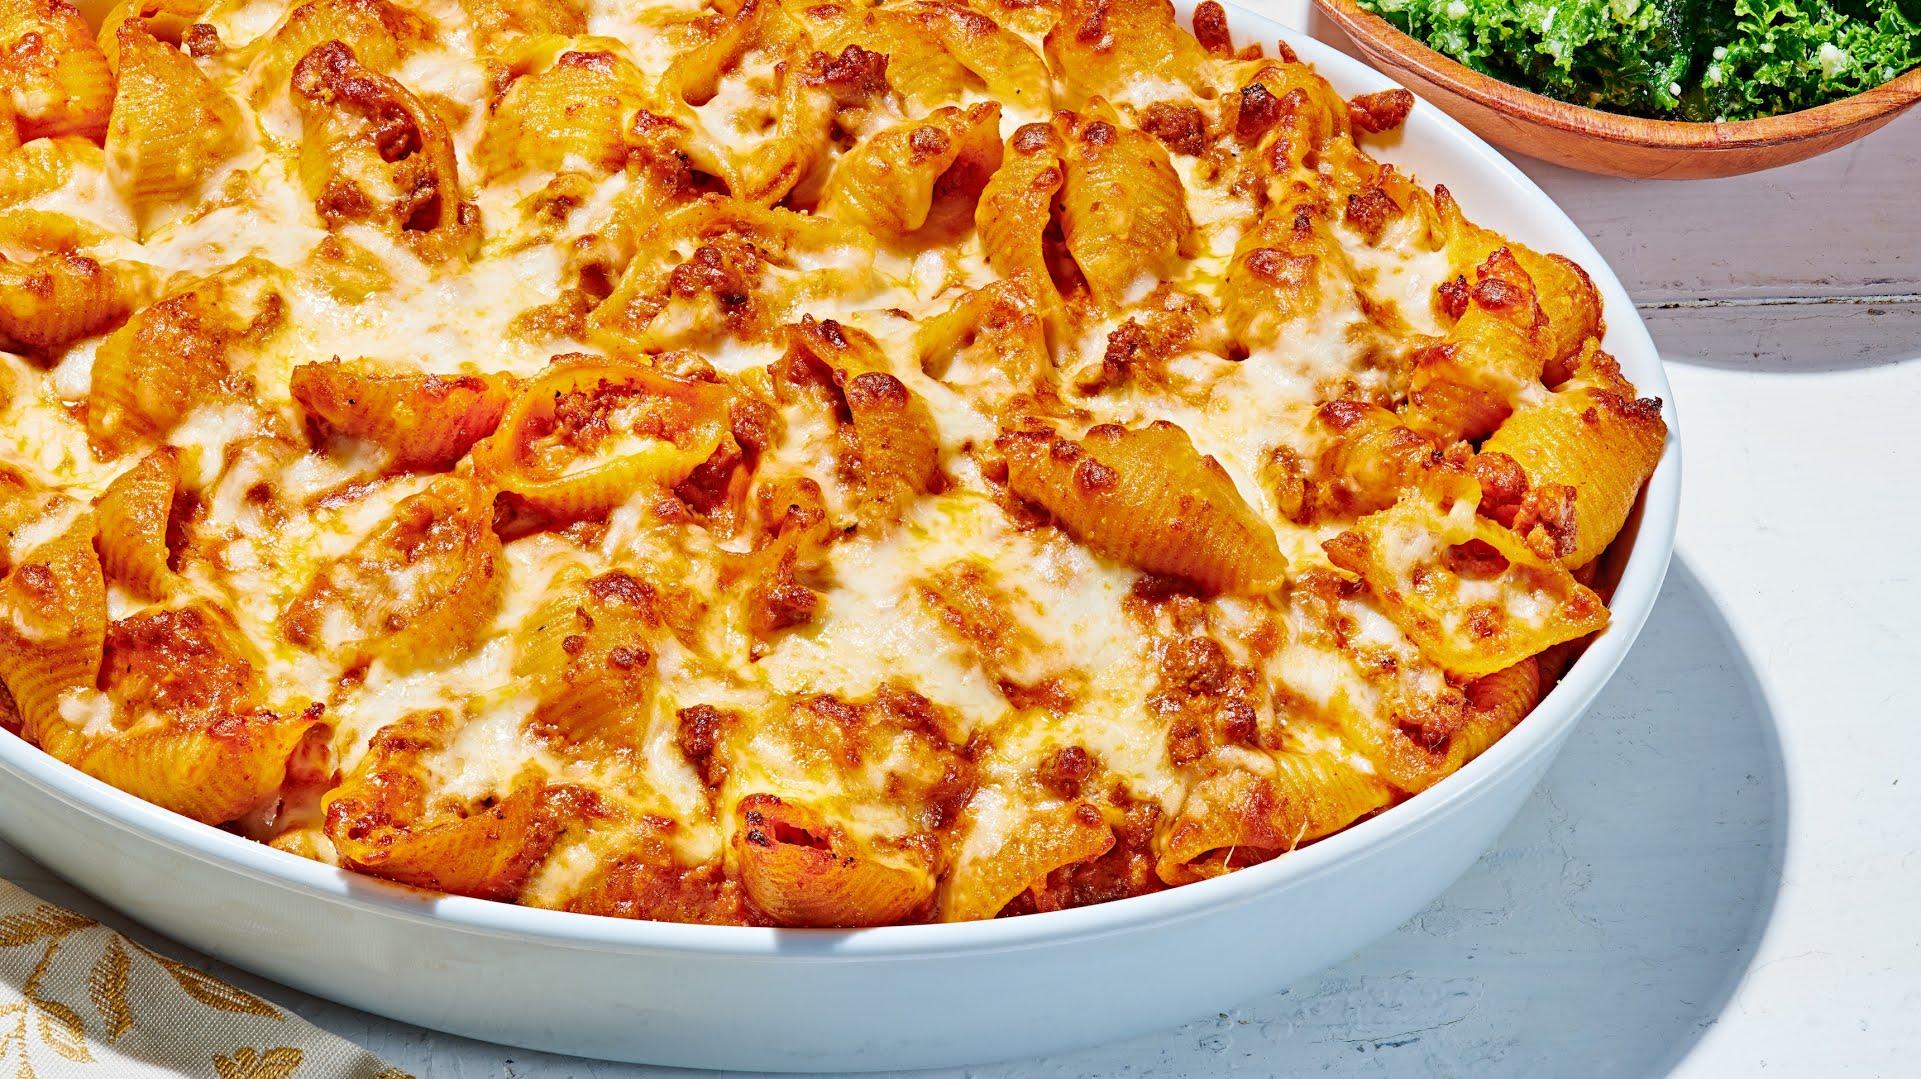 Pasta al forno favolosa 1568645927855-190911-Baked-Bolognese-129-V2.jpeg?crop=1xw:0.843xh;0xw,0